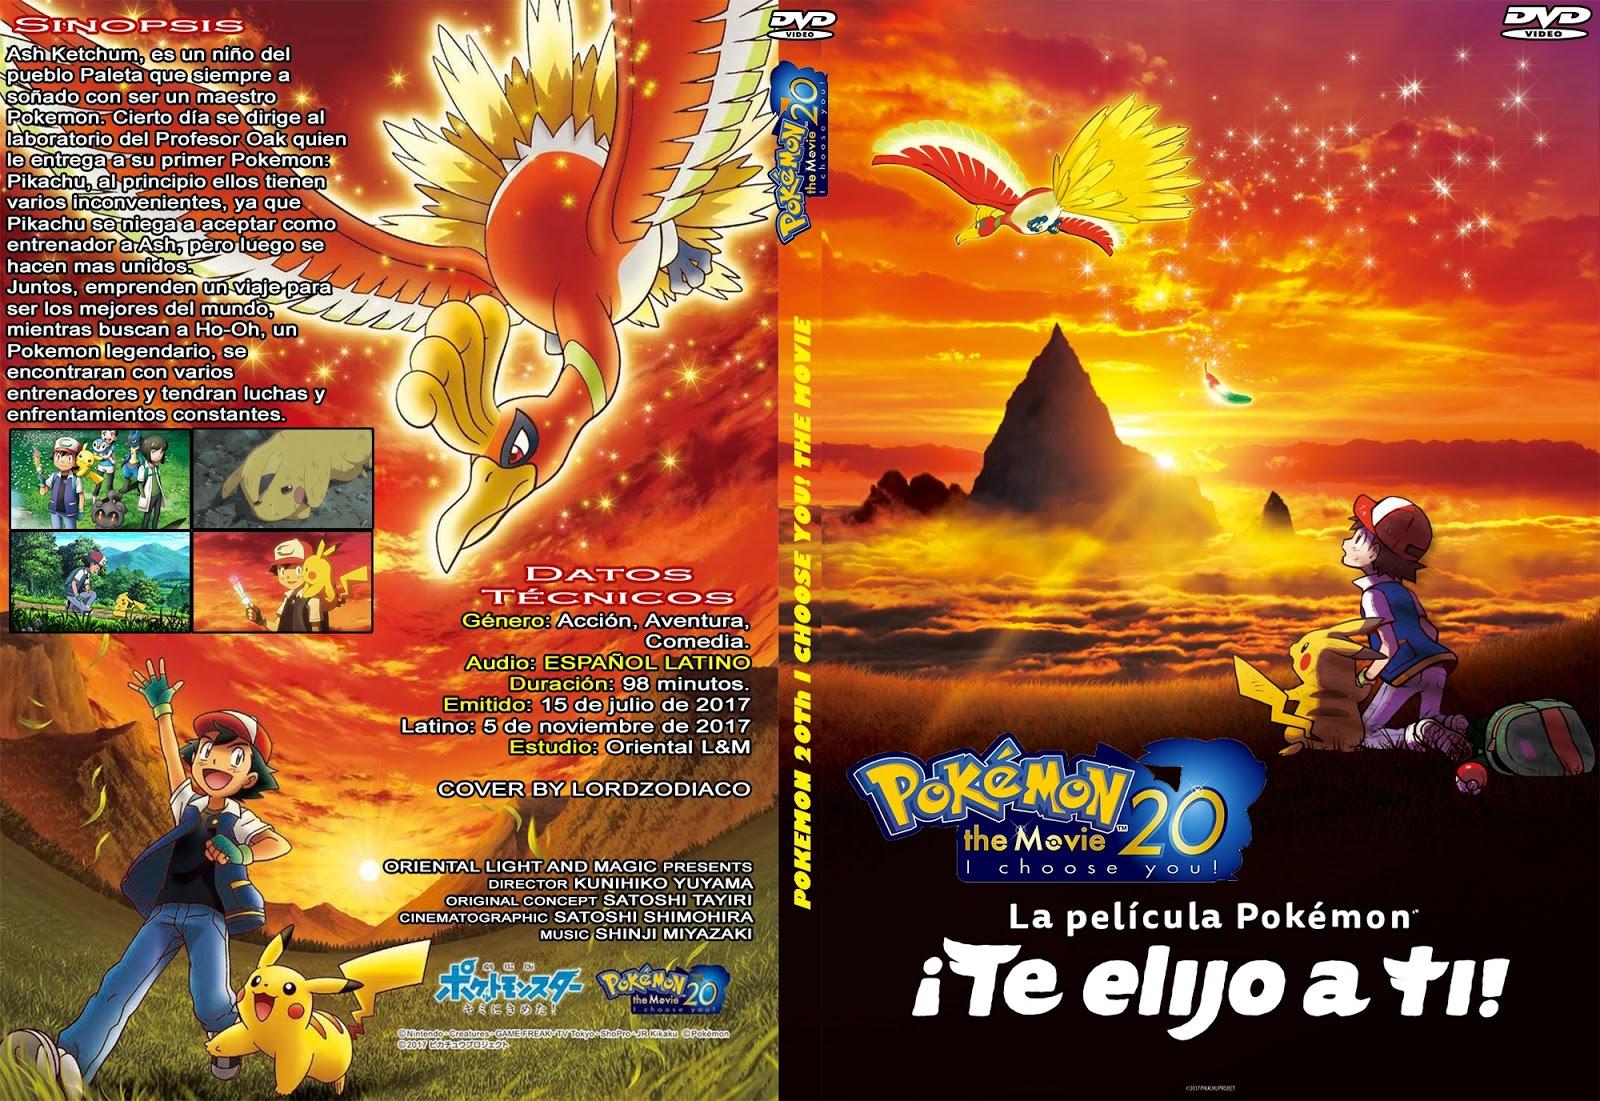 Pokemon 20 Te Elijo A Ti Pelicula Cover Dvd Lordzodiaco